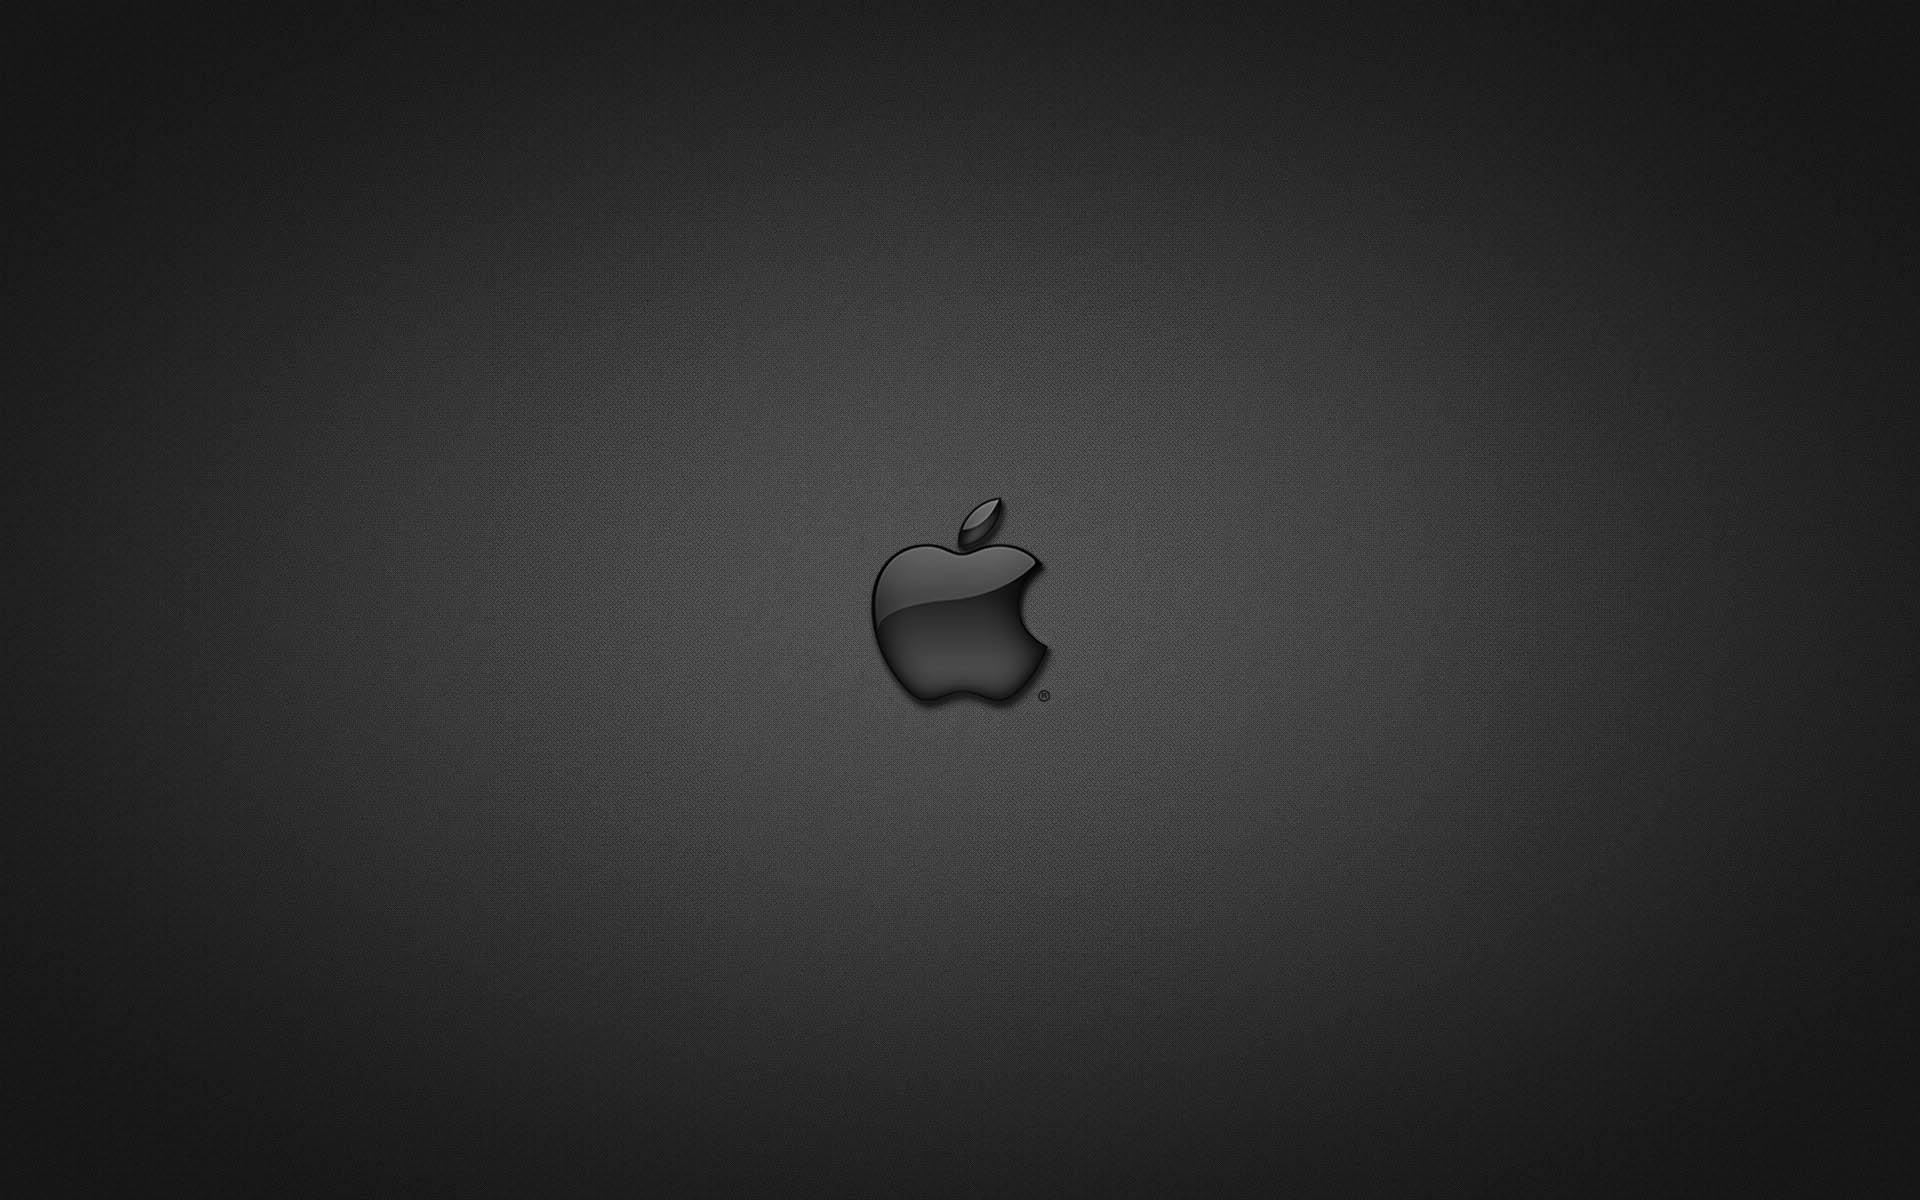 mac powerpoint for mac tema apple wallpaper hd wallpaper power 1920x1200